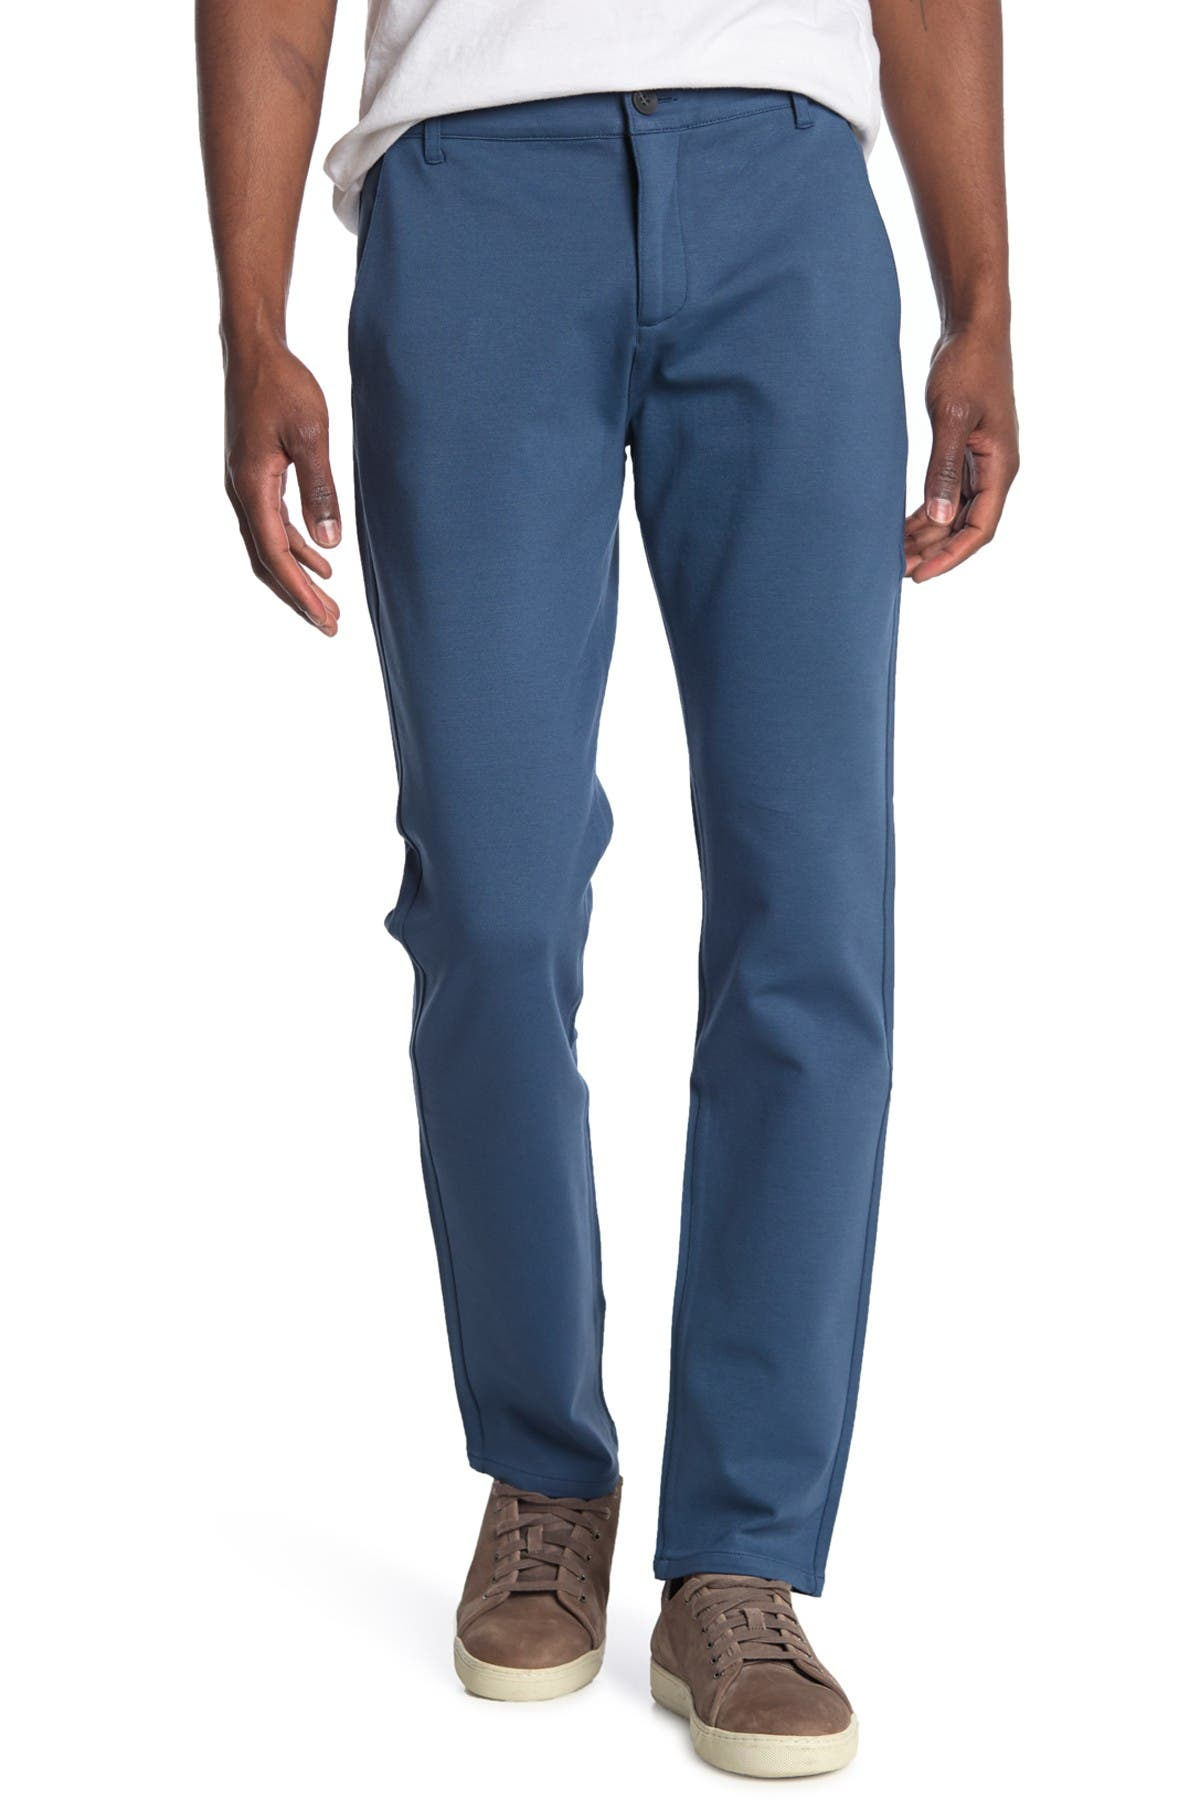 Image of PAIGE Brennan Chino Pants